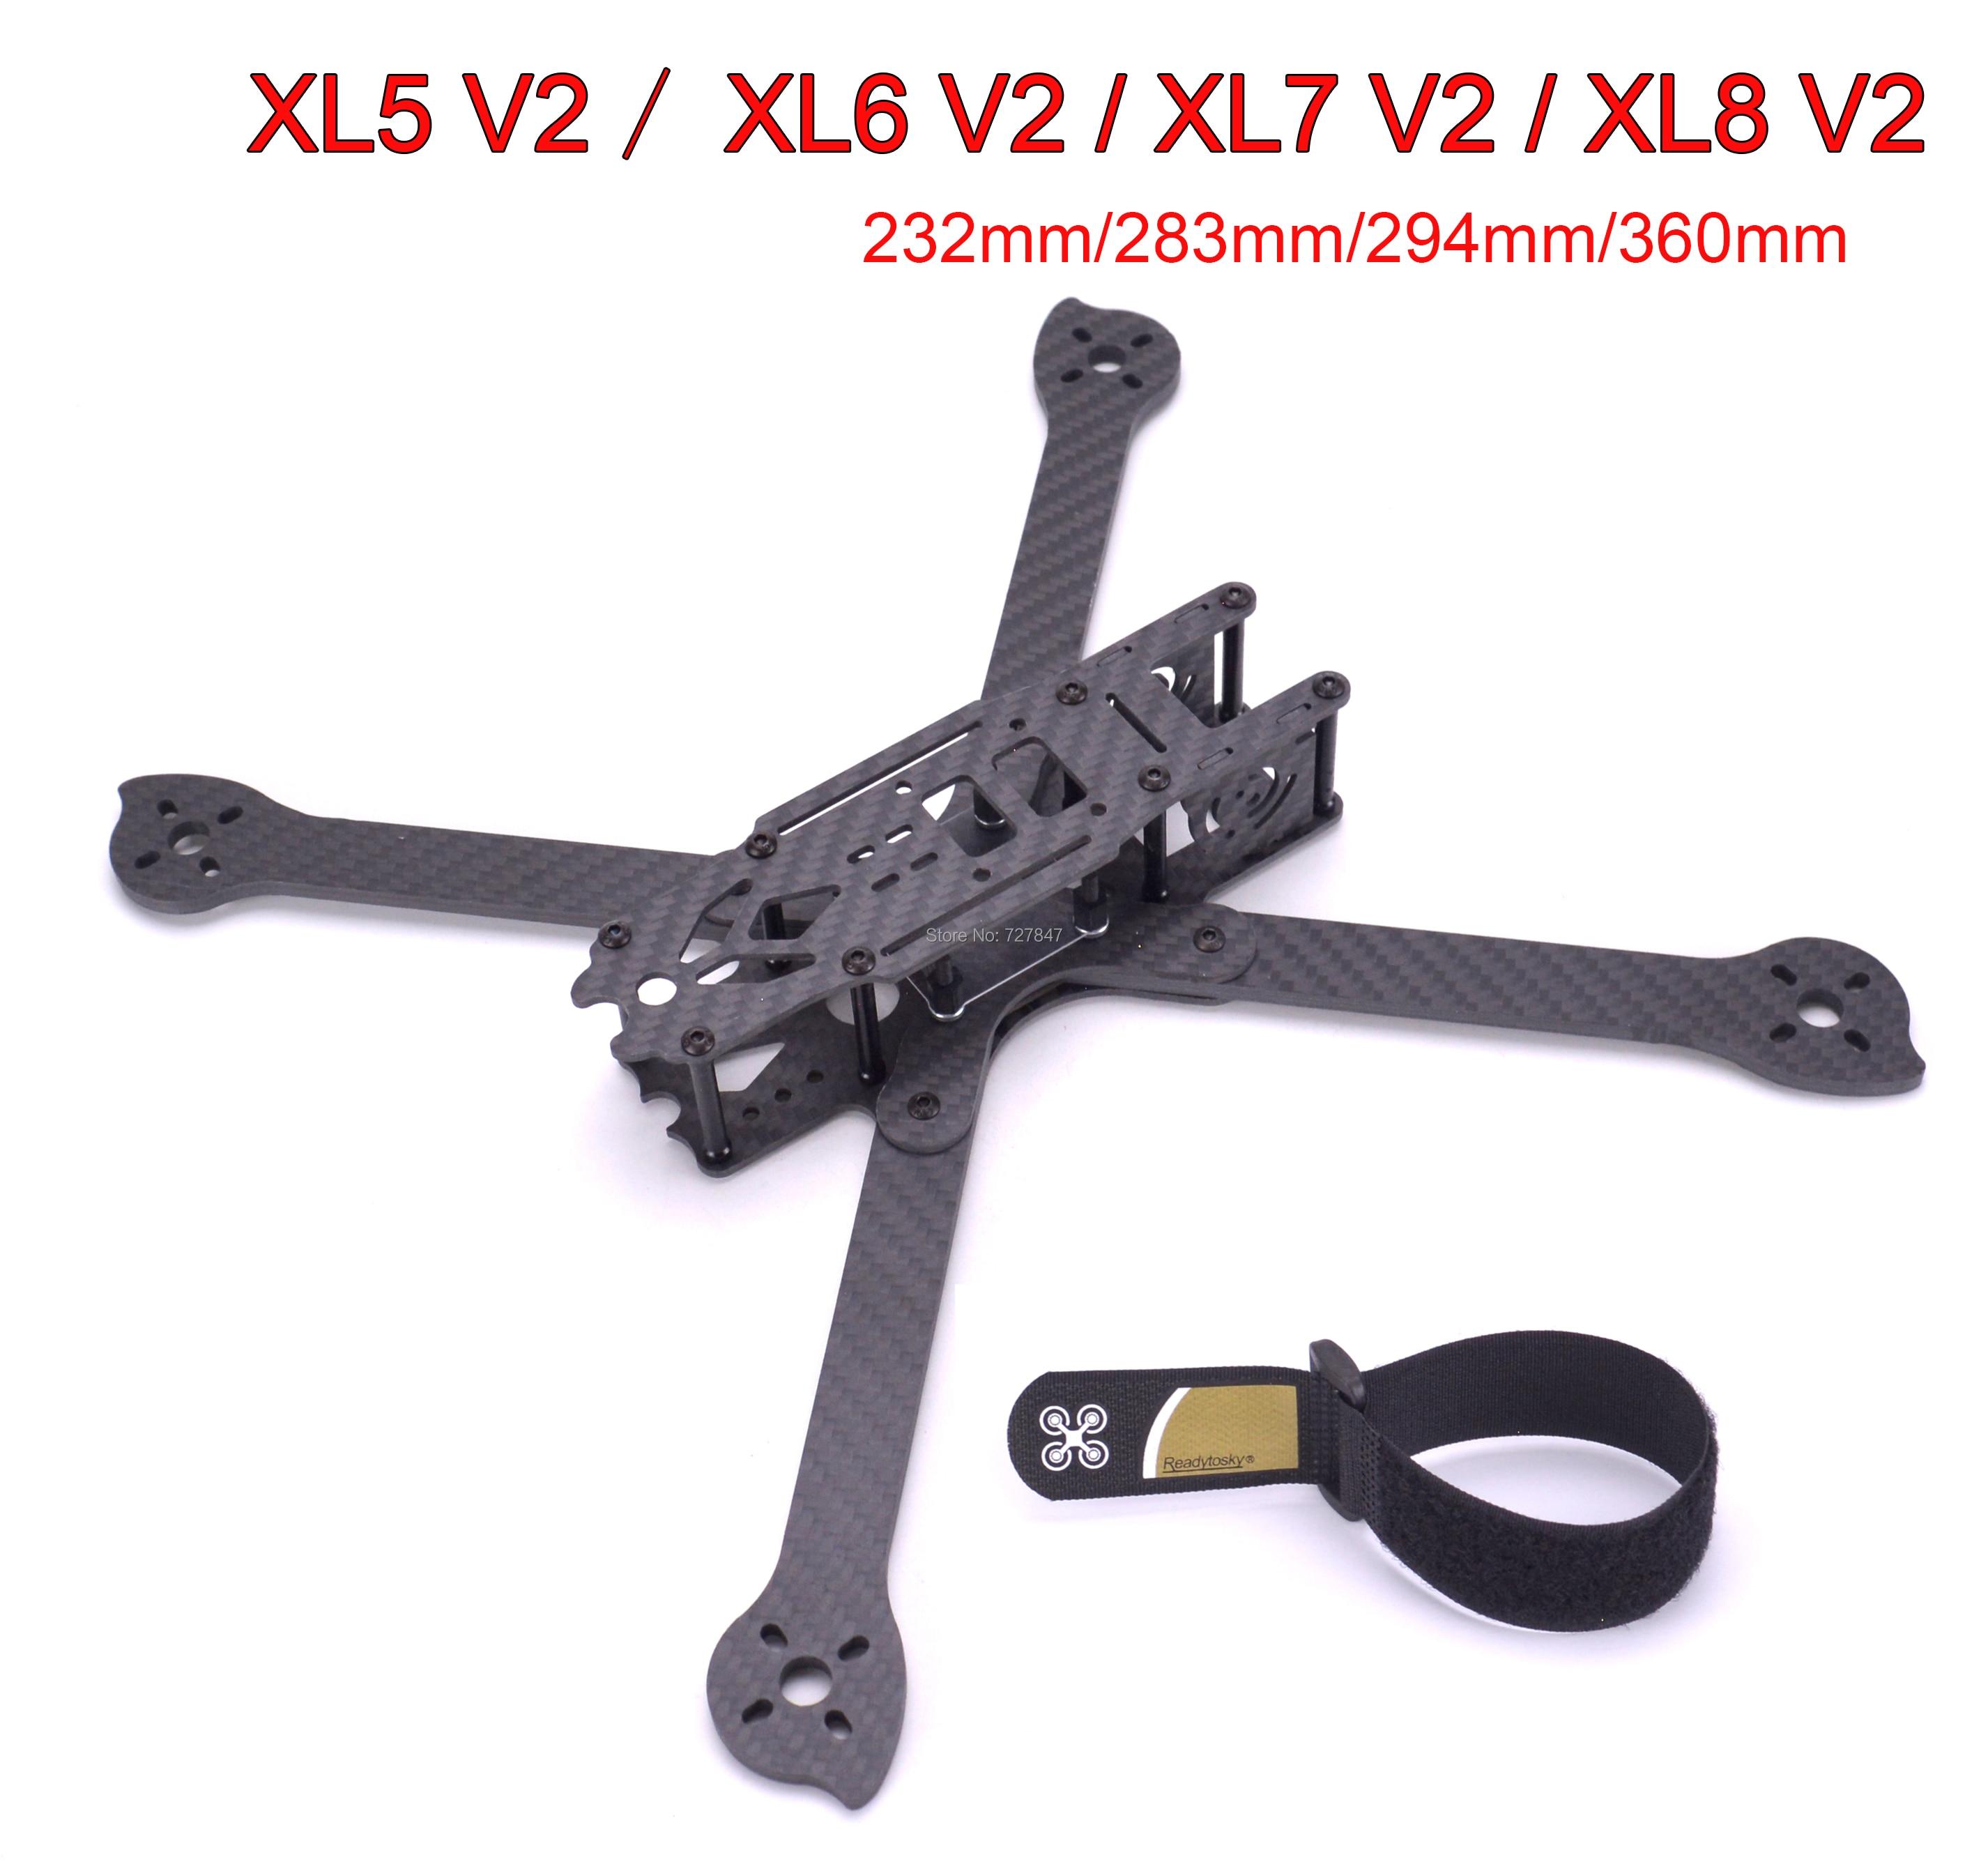 3K Full Carbon Fiber TrueX XL5 V2 232mm/ XL6 V2 283mm / XL7 V2 294mm / XL8 V2 360mm/XL9 V2 390mm Arm 4mm Freestyle Frame for FPV